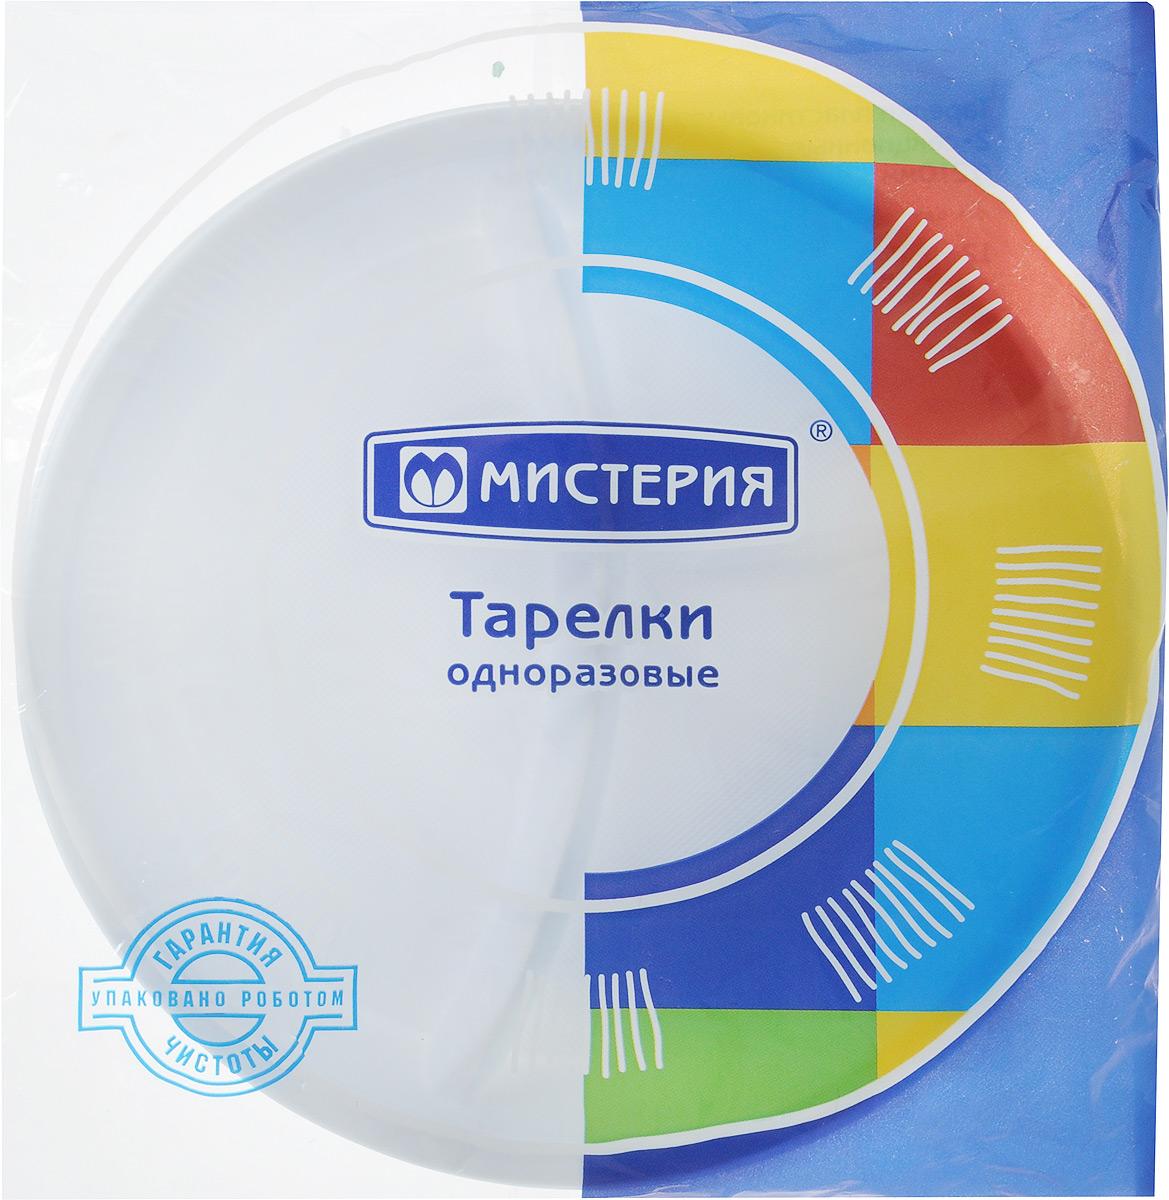 "Тарелка одноразовая ""Мистерия"", 2 секции, диаметр 21 см, 12 шт 183405"